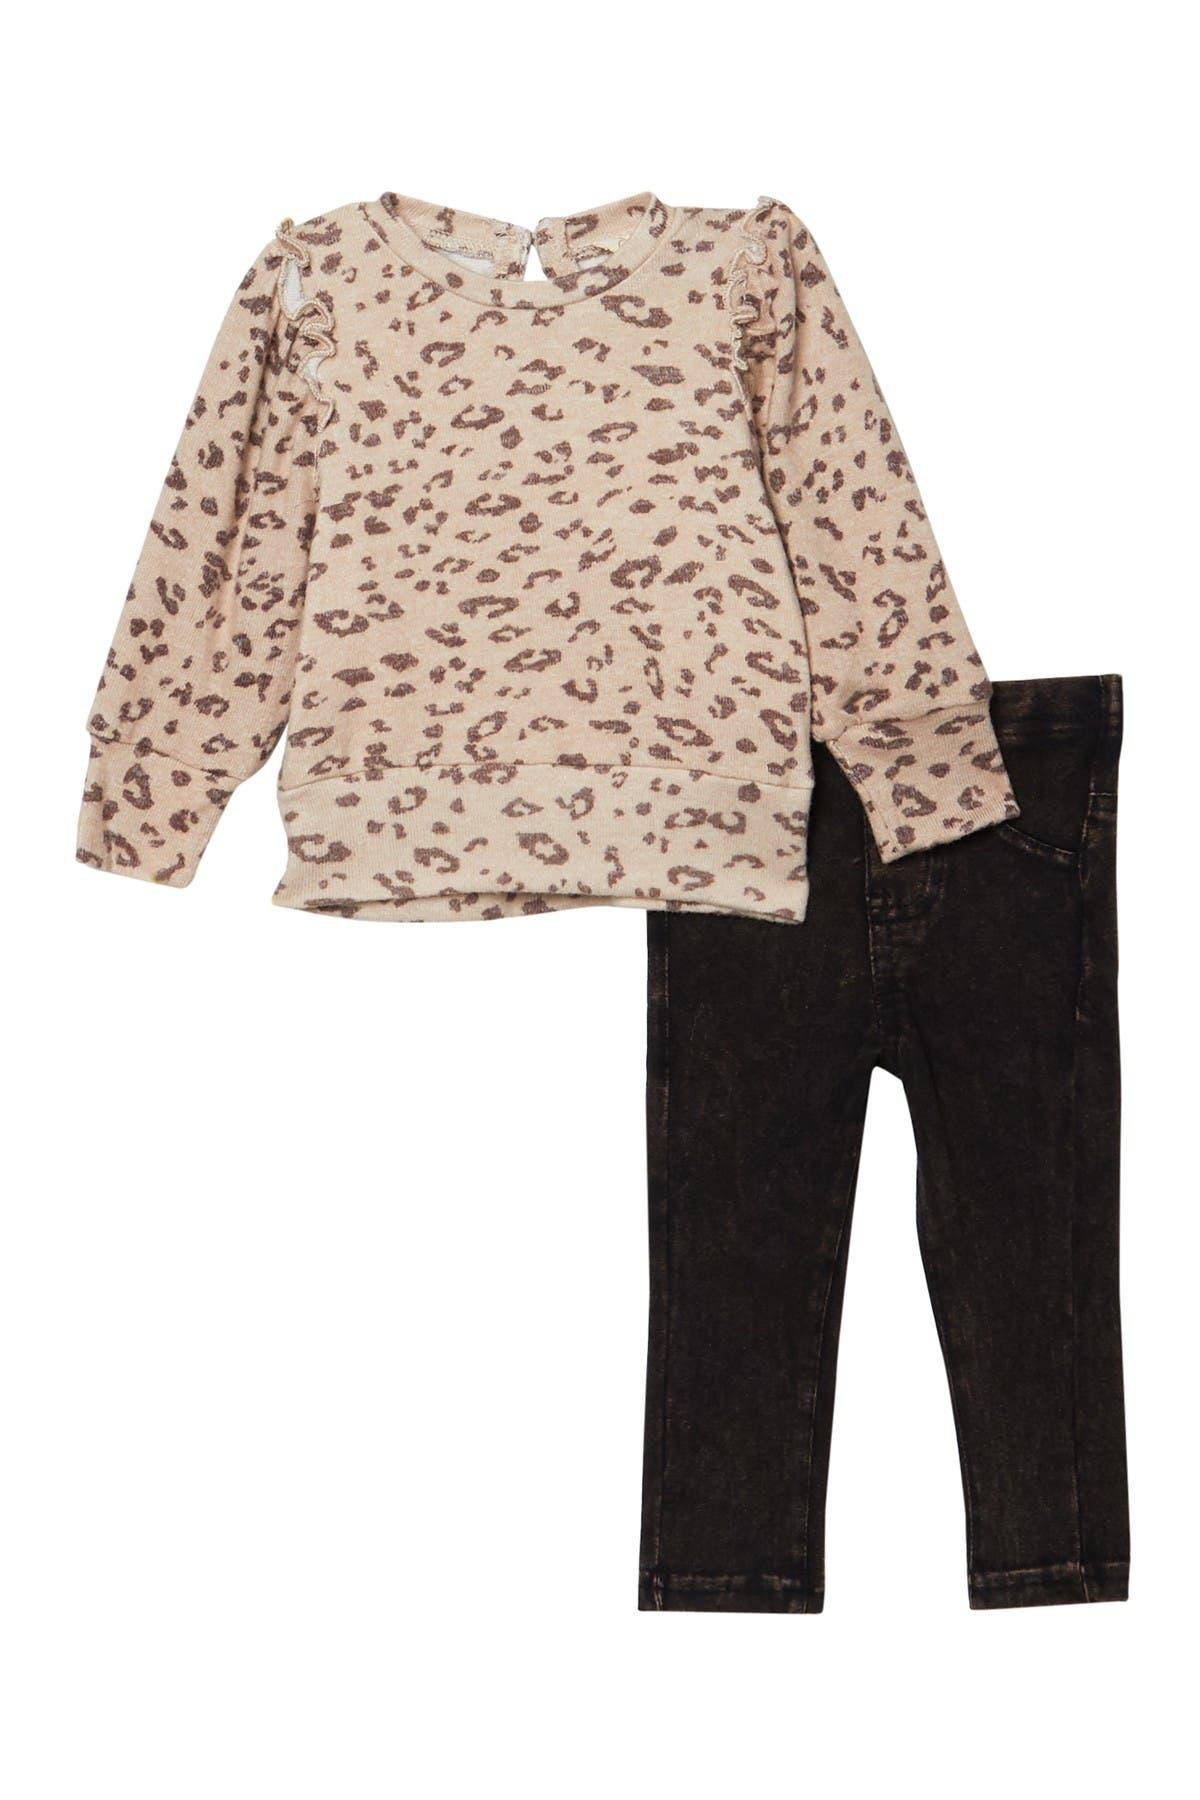 Image of Jessica Simpson Long Sleeve Ruffled Top & Pants Set